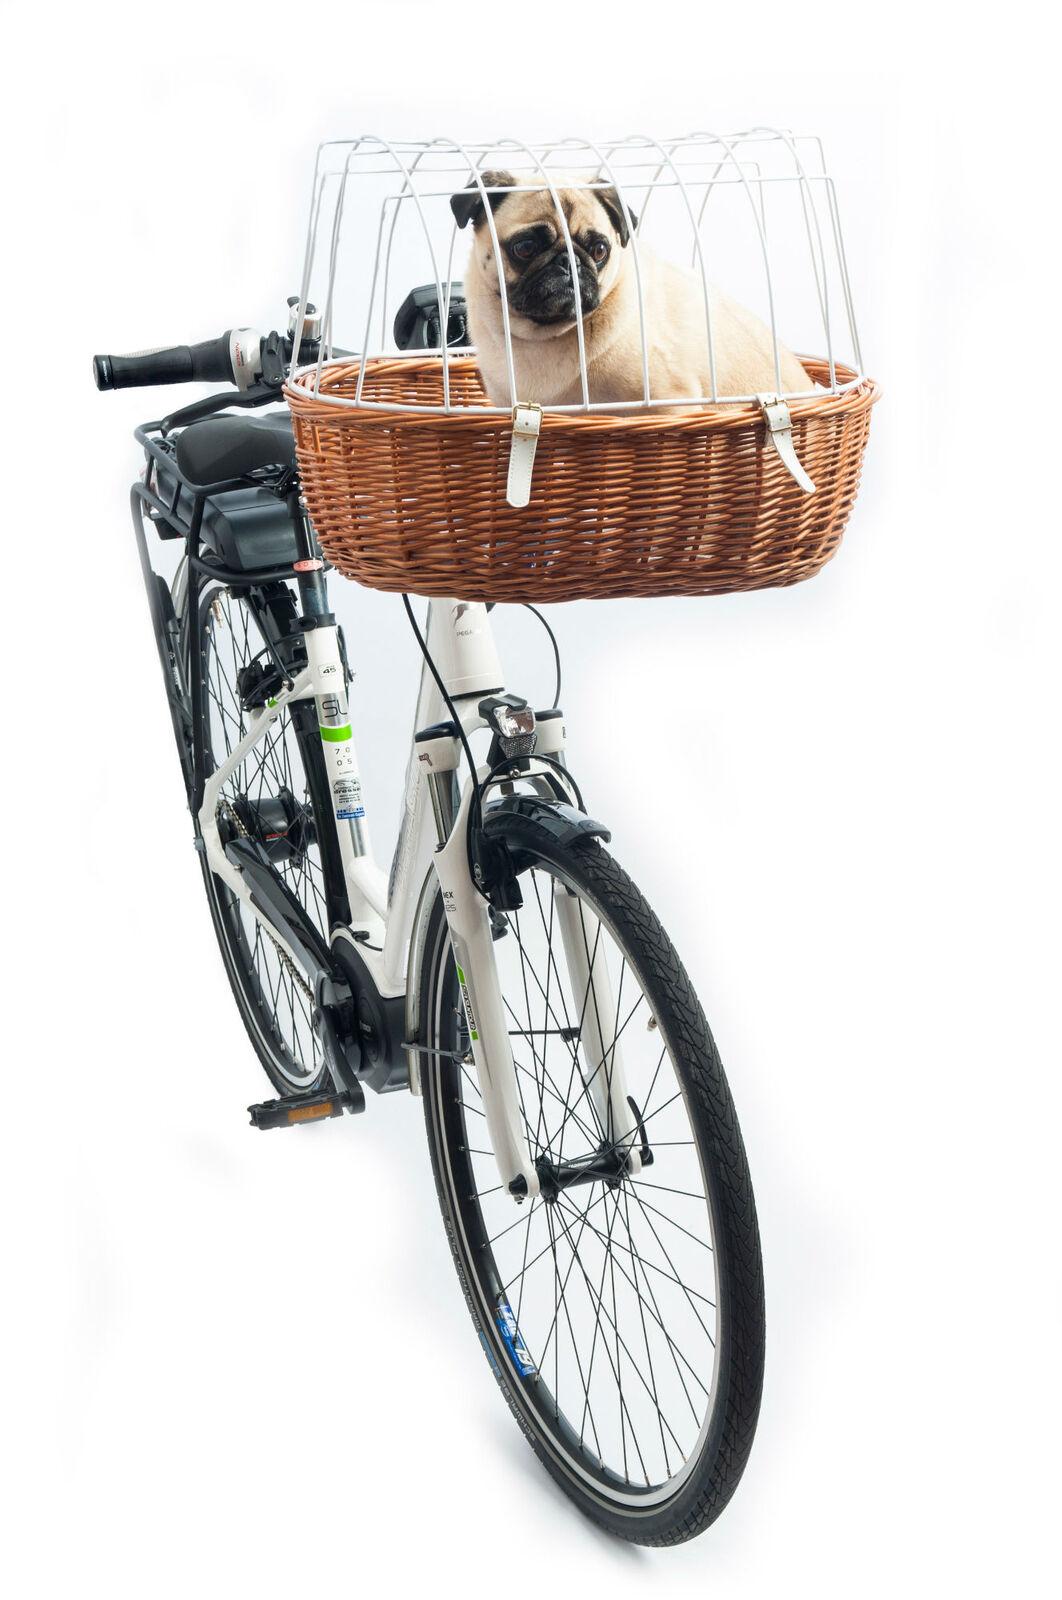 Aumüller E-Bike fähiger Fahrradkorb Standard mit Steuerkopfmontagesystem 167 52x38x18/40cm